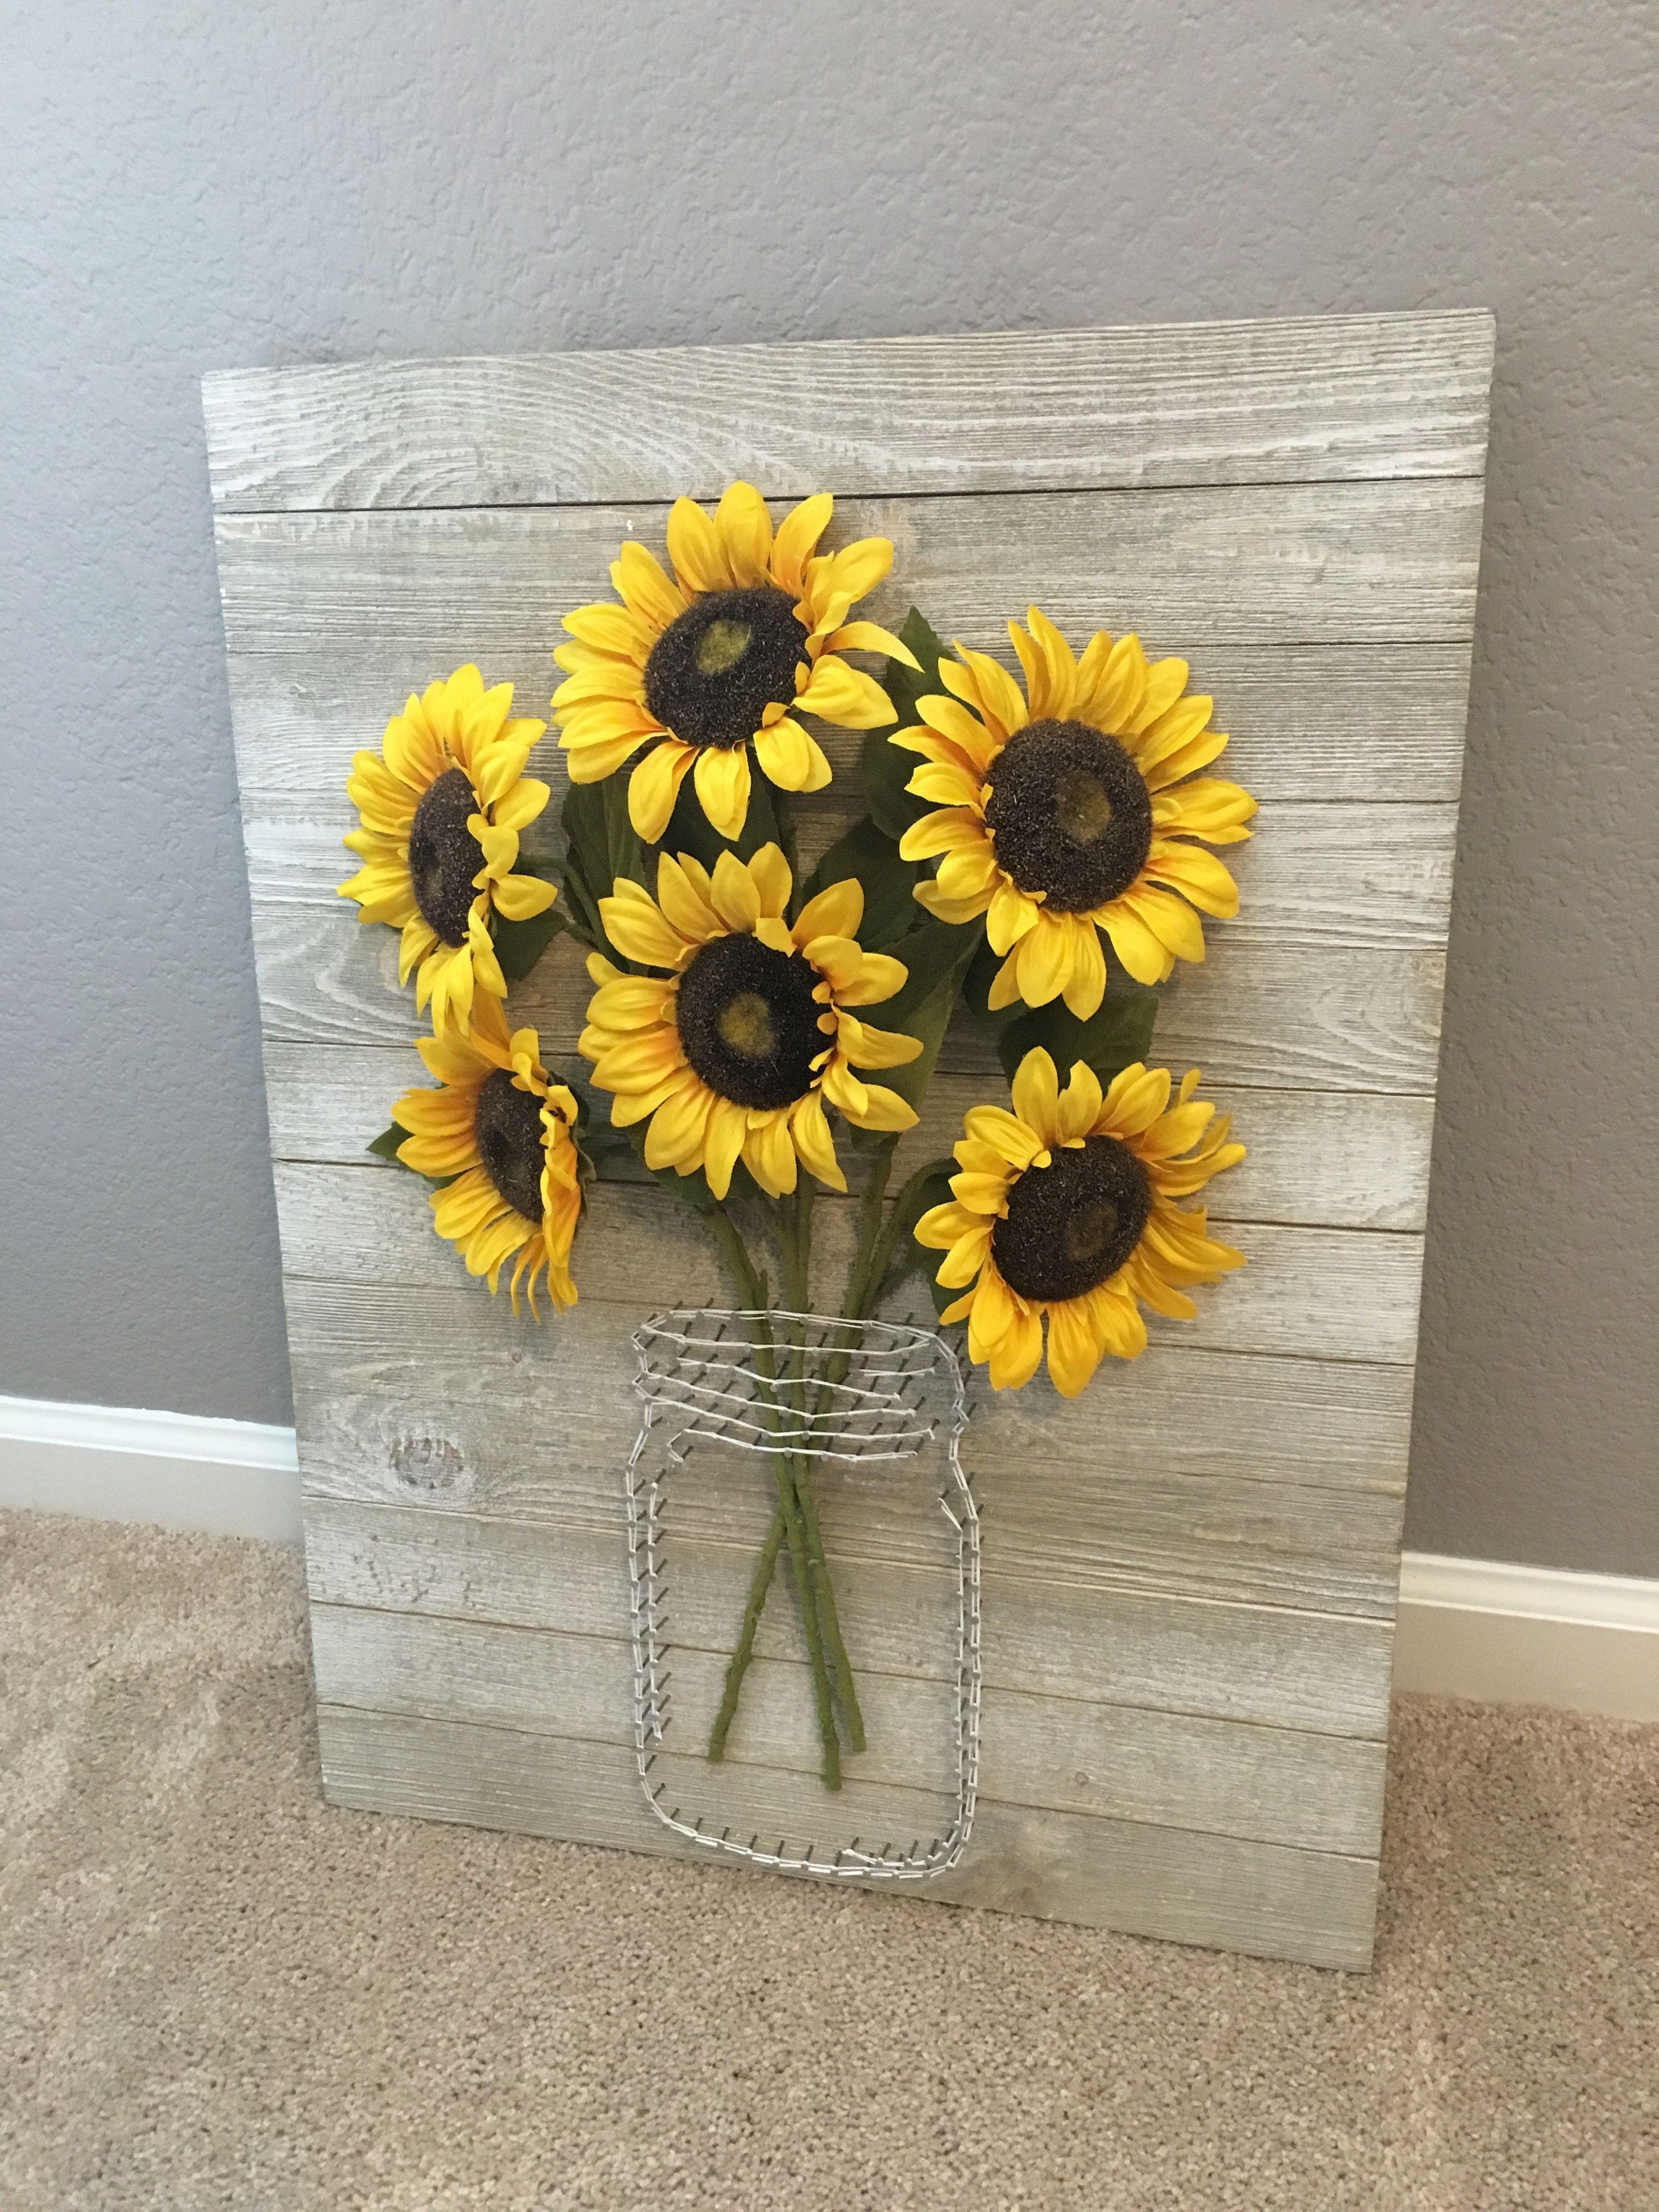 35 Inspirational Sunflower Wall Art | Wall Art Decorative In Most Current Sunflower Wall Art (Gallery 8 of 20)